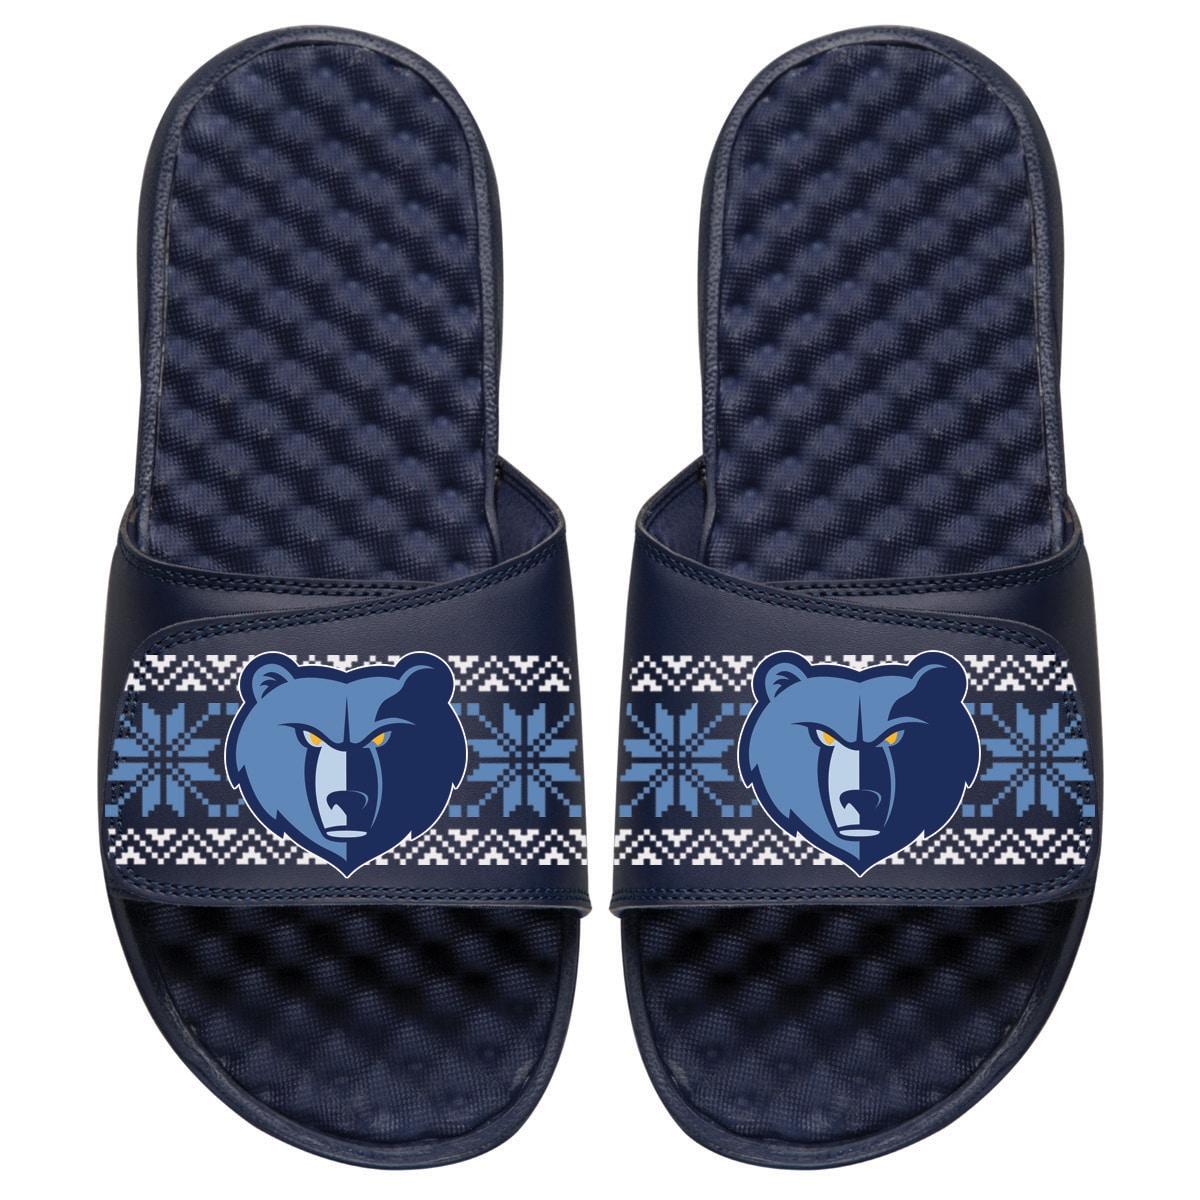 Memphis Grizzlies ISlide Ugly Sweater Slide Sandals - Navy